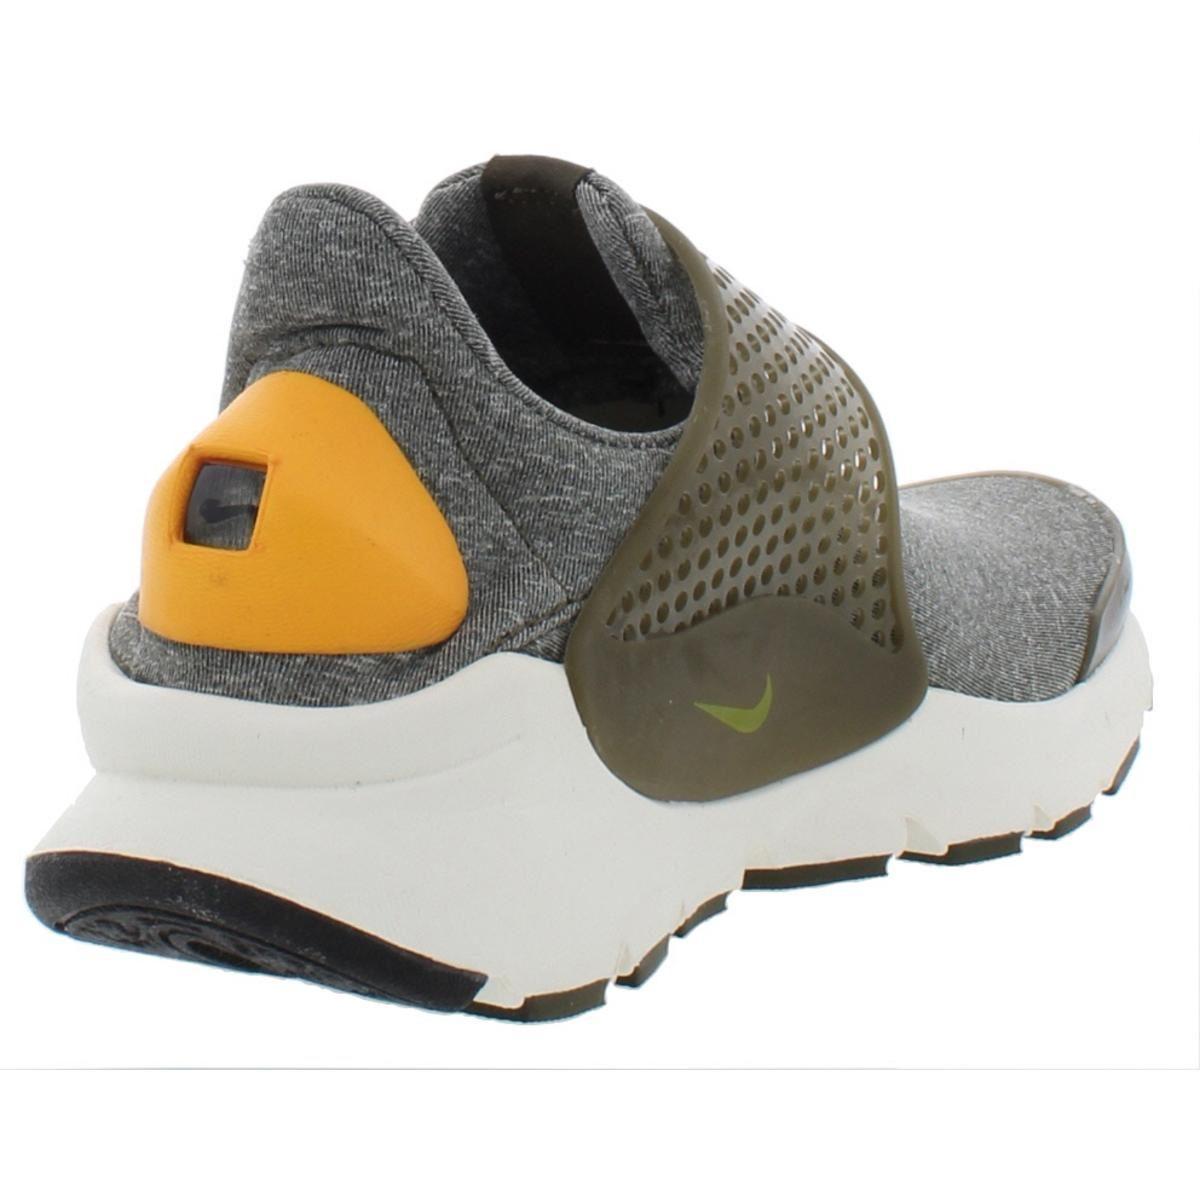 b8d9c02a8ac9d Nike Womens Sock Dart SE Running Athletic Shoes